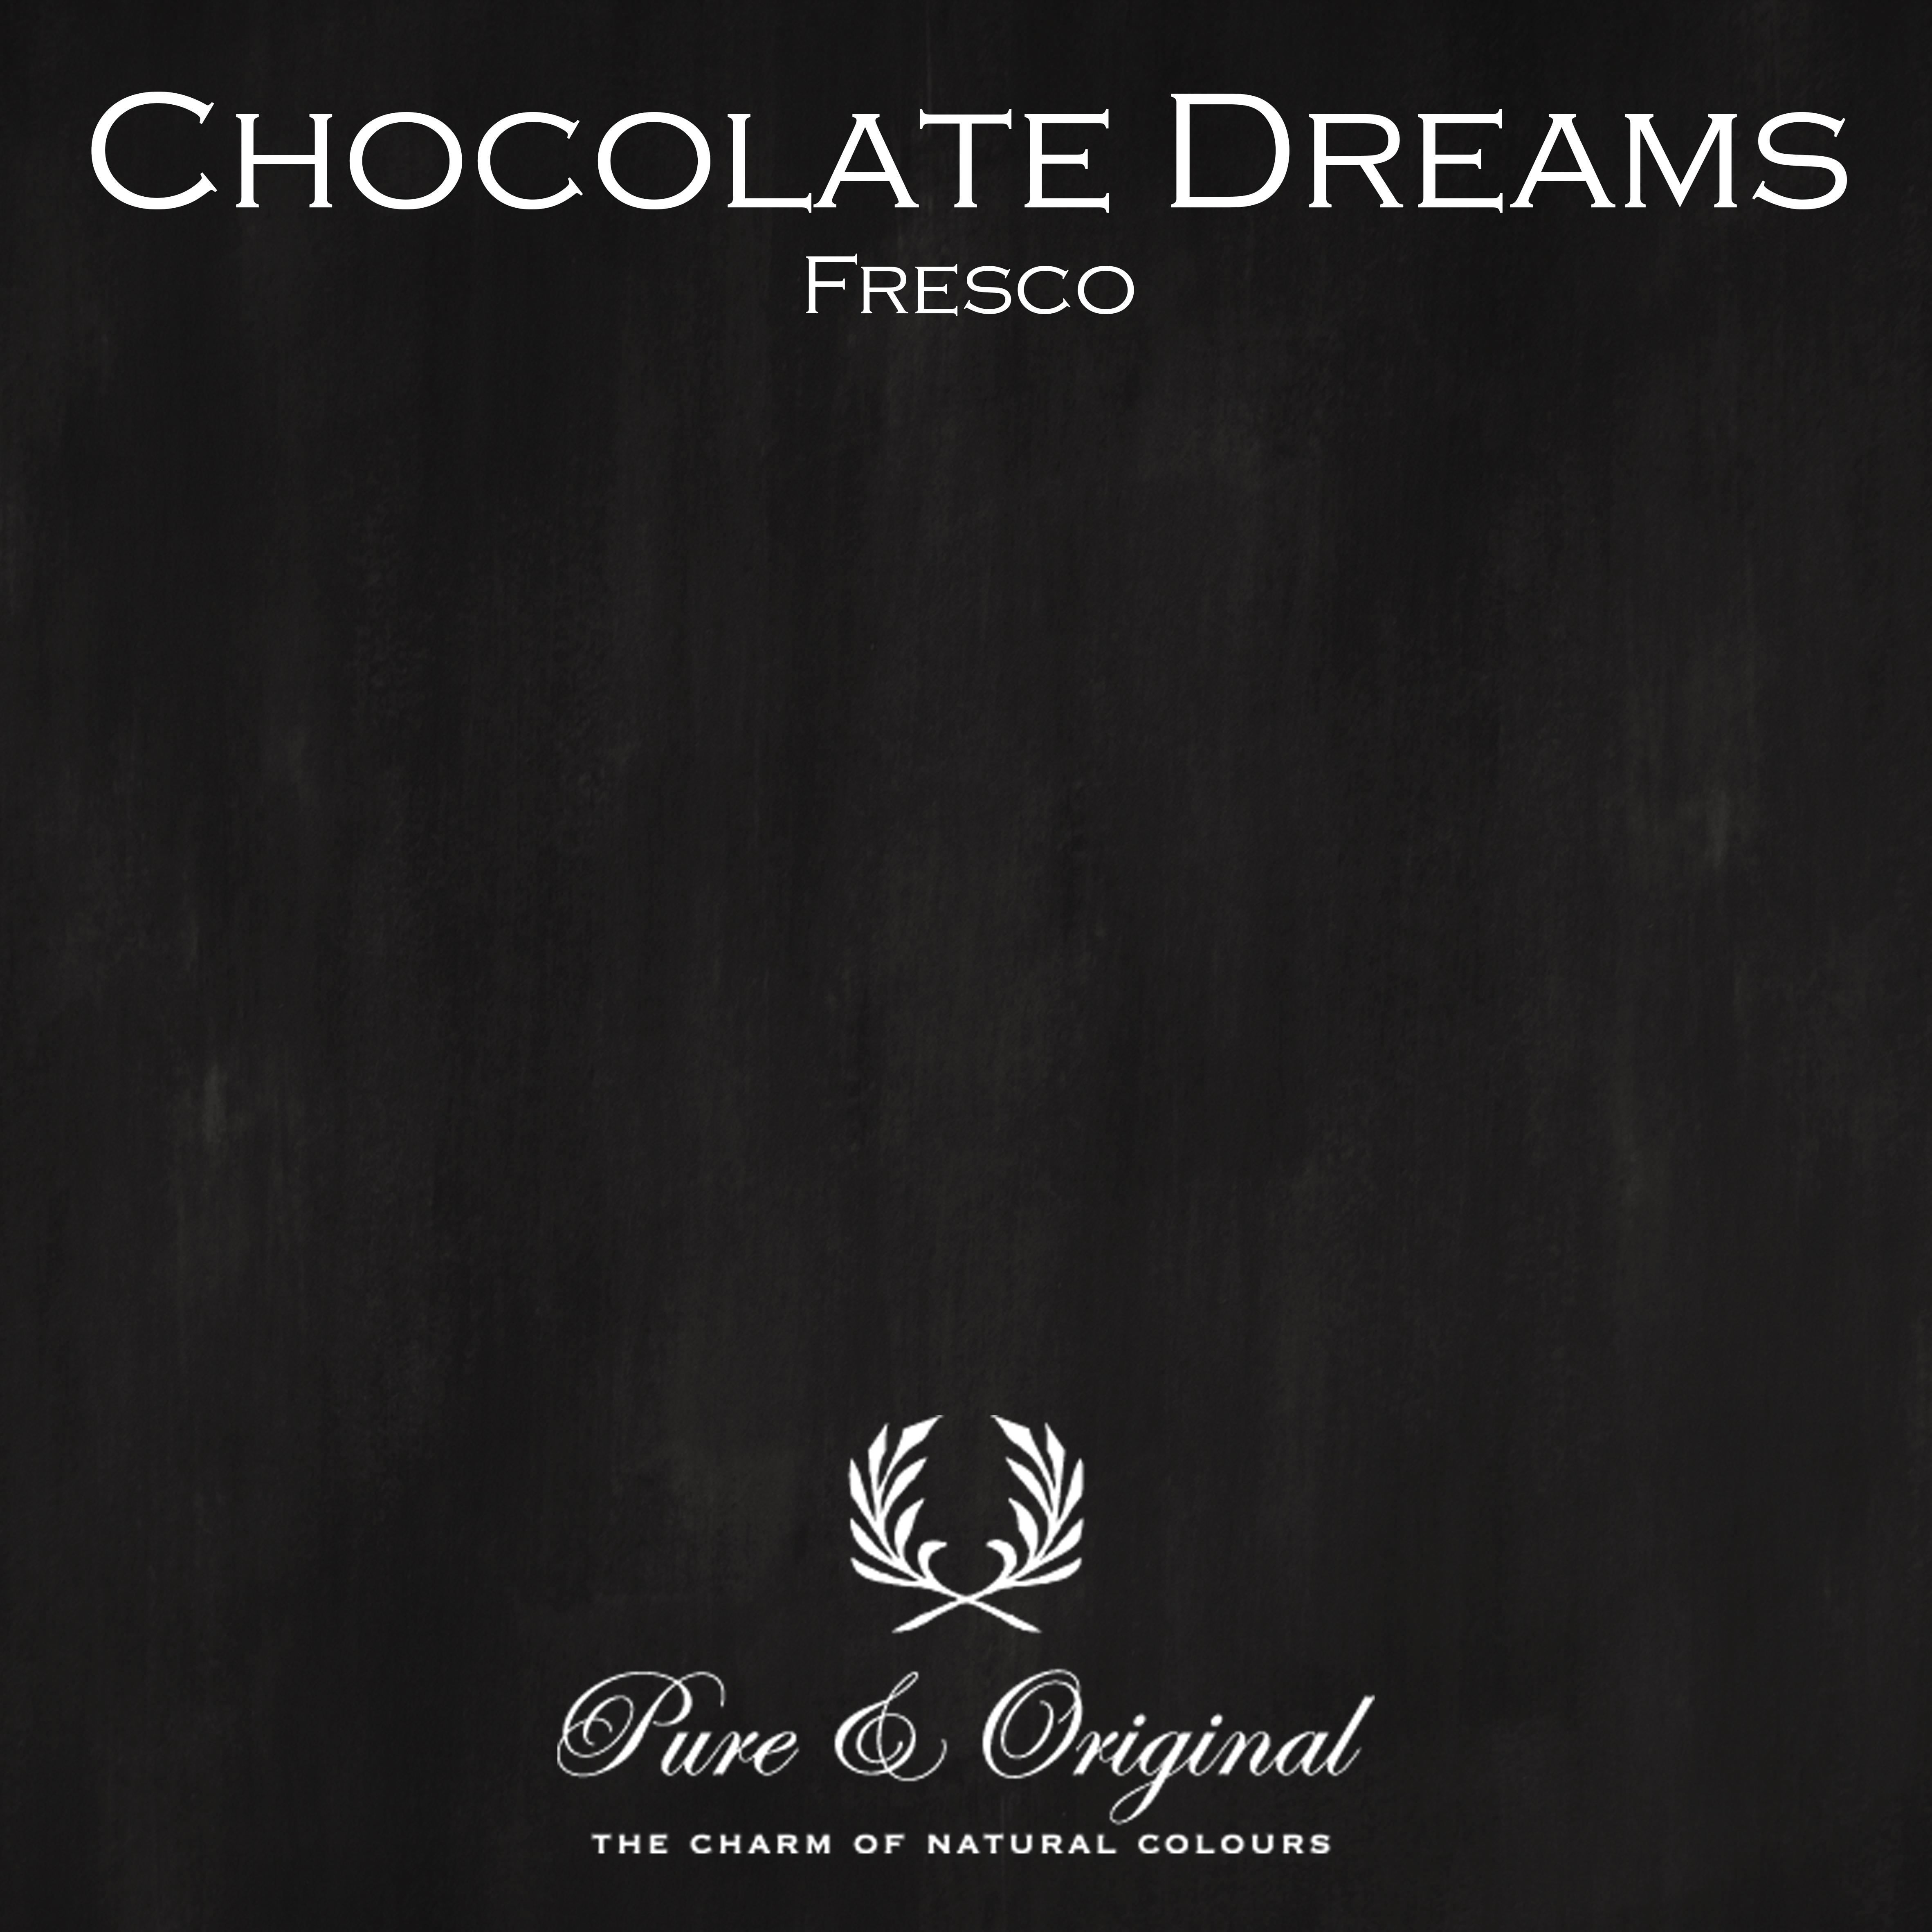 Kulör Chocolate Dreams, Fresco kalkfärg